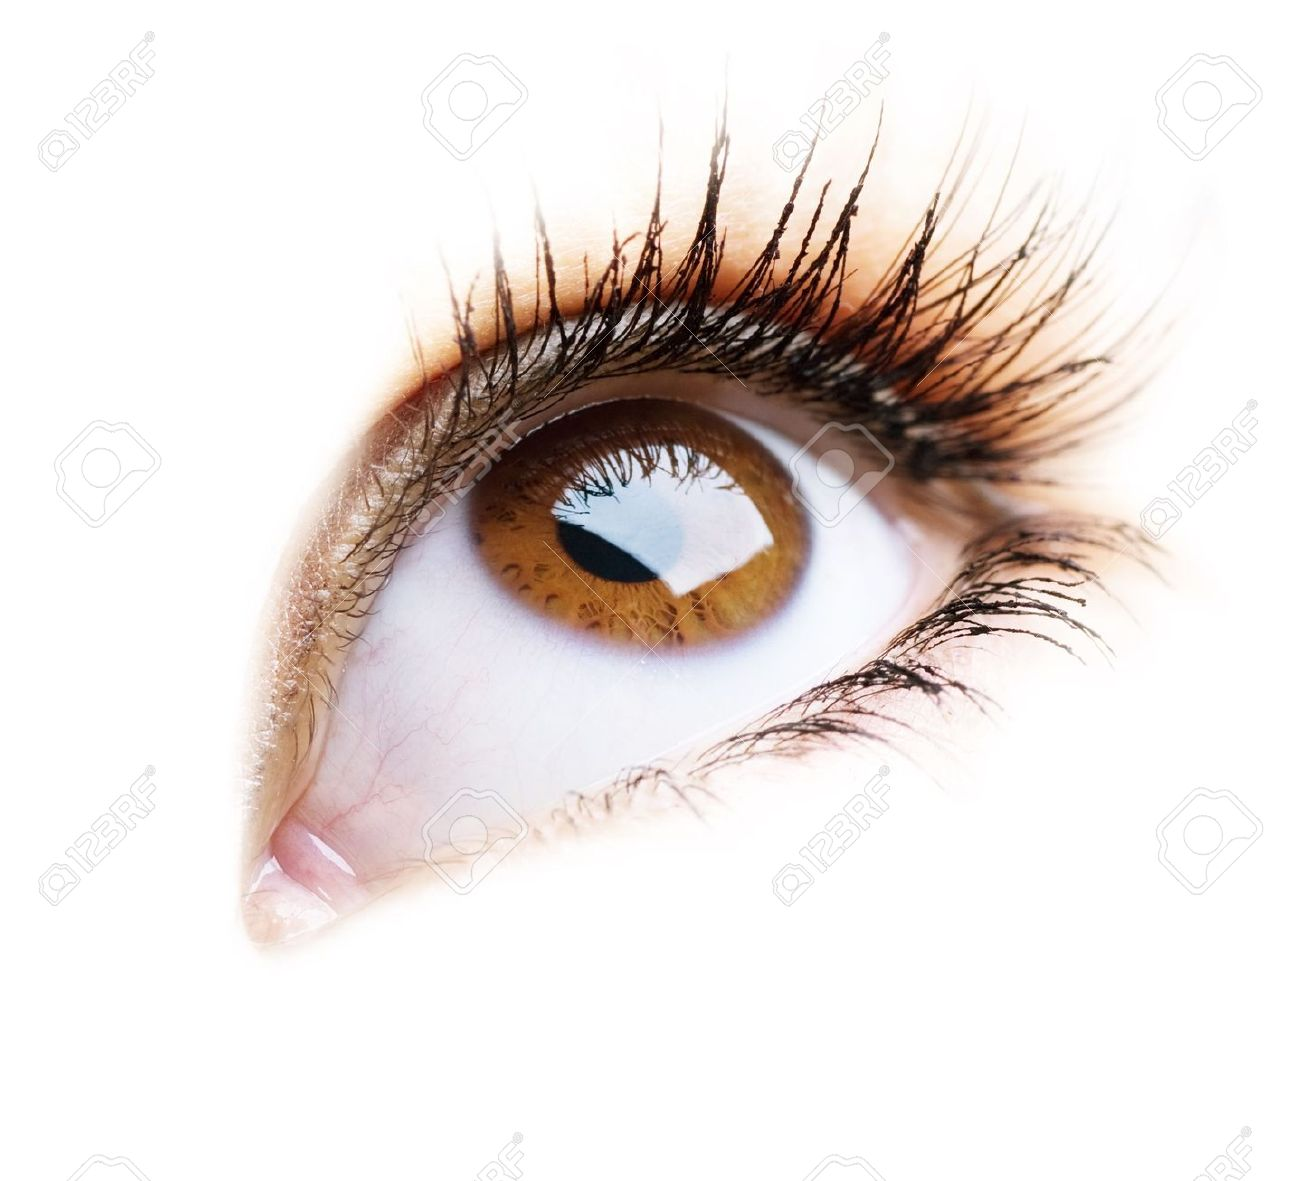 Beautiful Eye of Woman over white background Stock Photo - 7815165